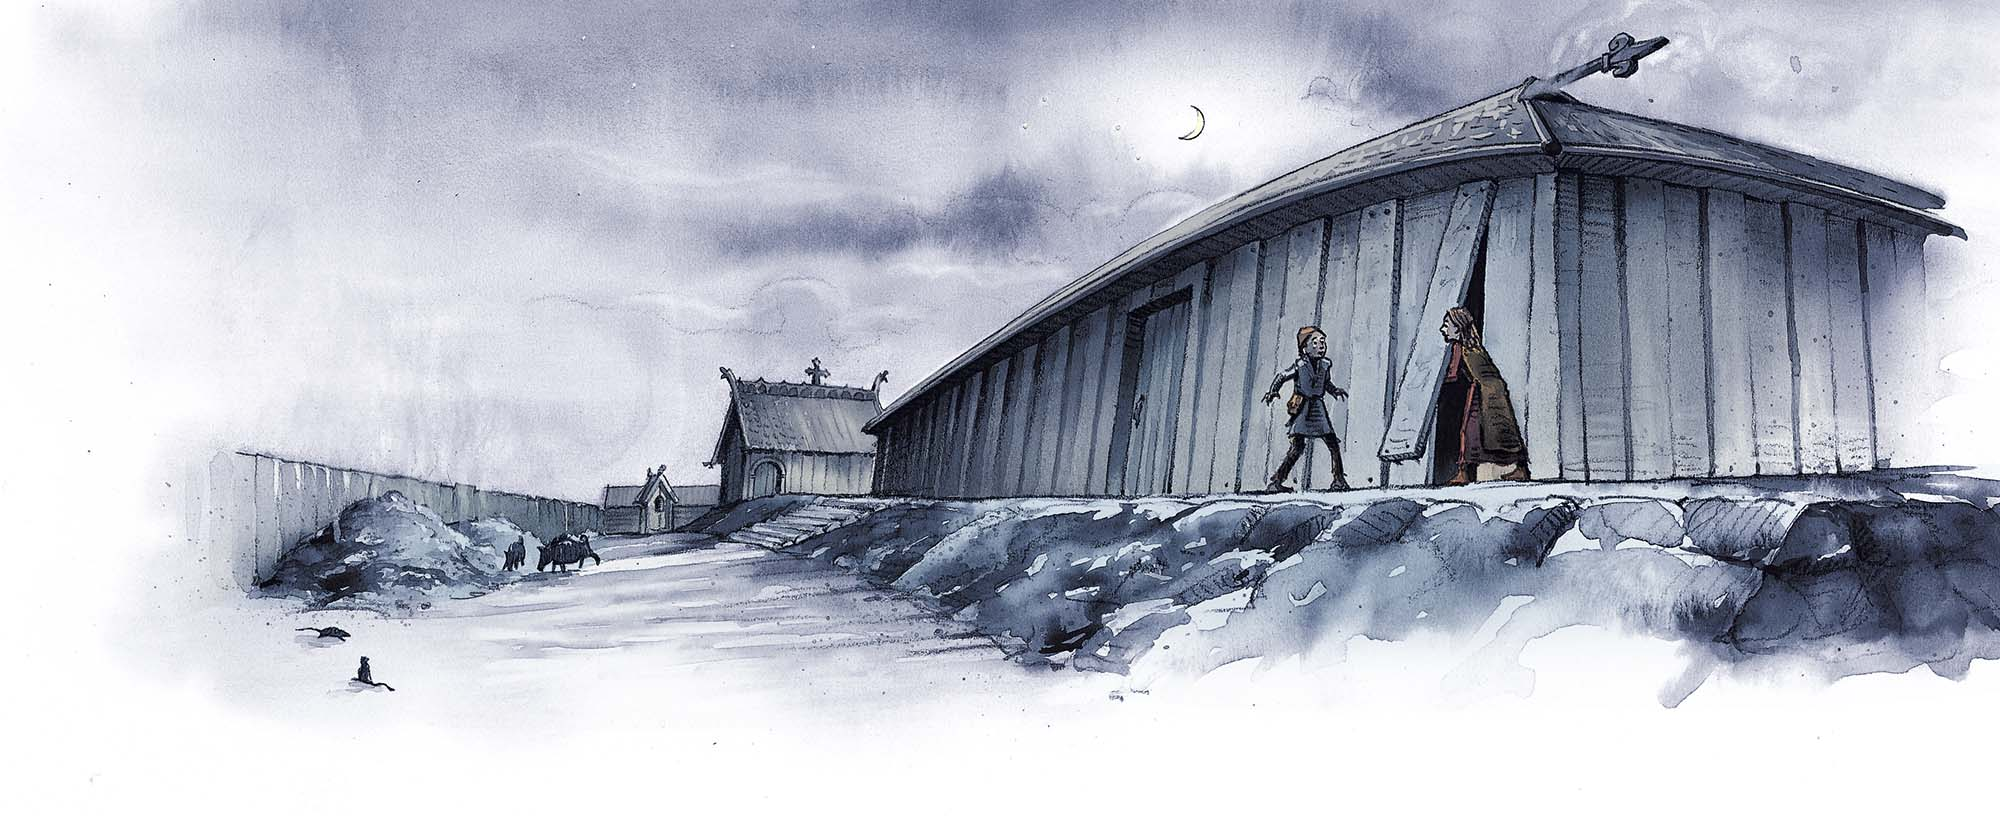 The Chieftain's Cup: Longhouse night scene (Client: Bonnier Carlsen Publishing House, Sweden).